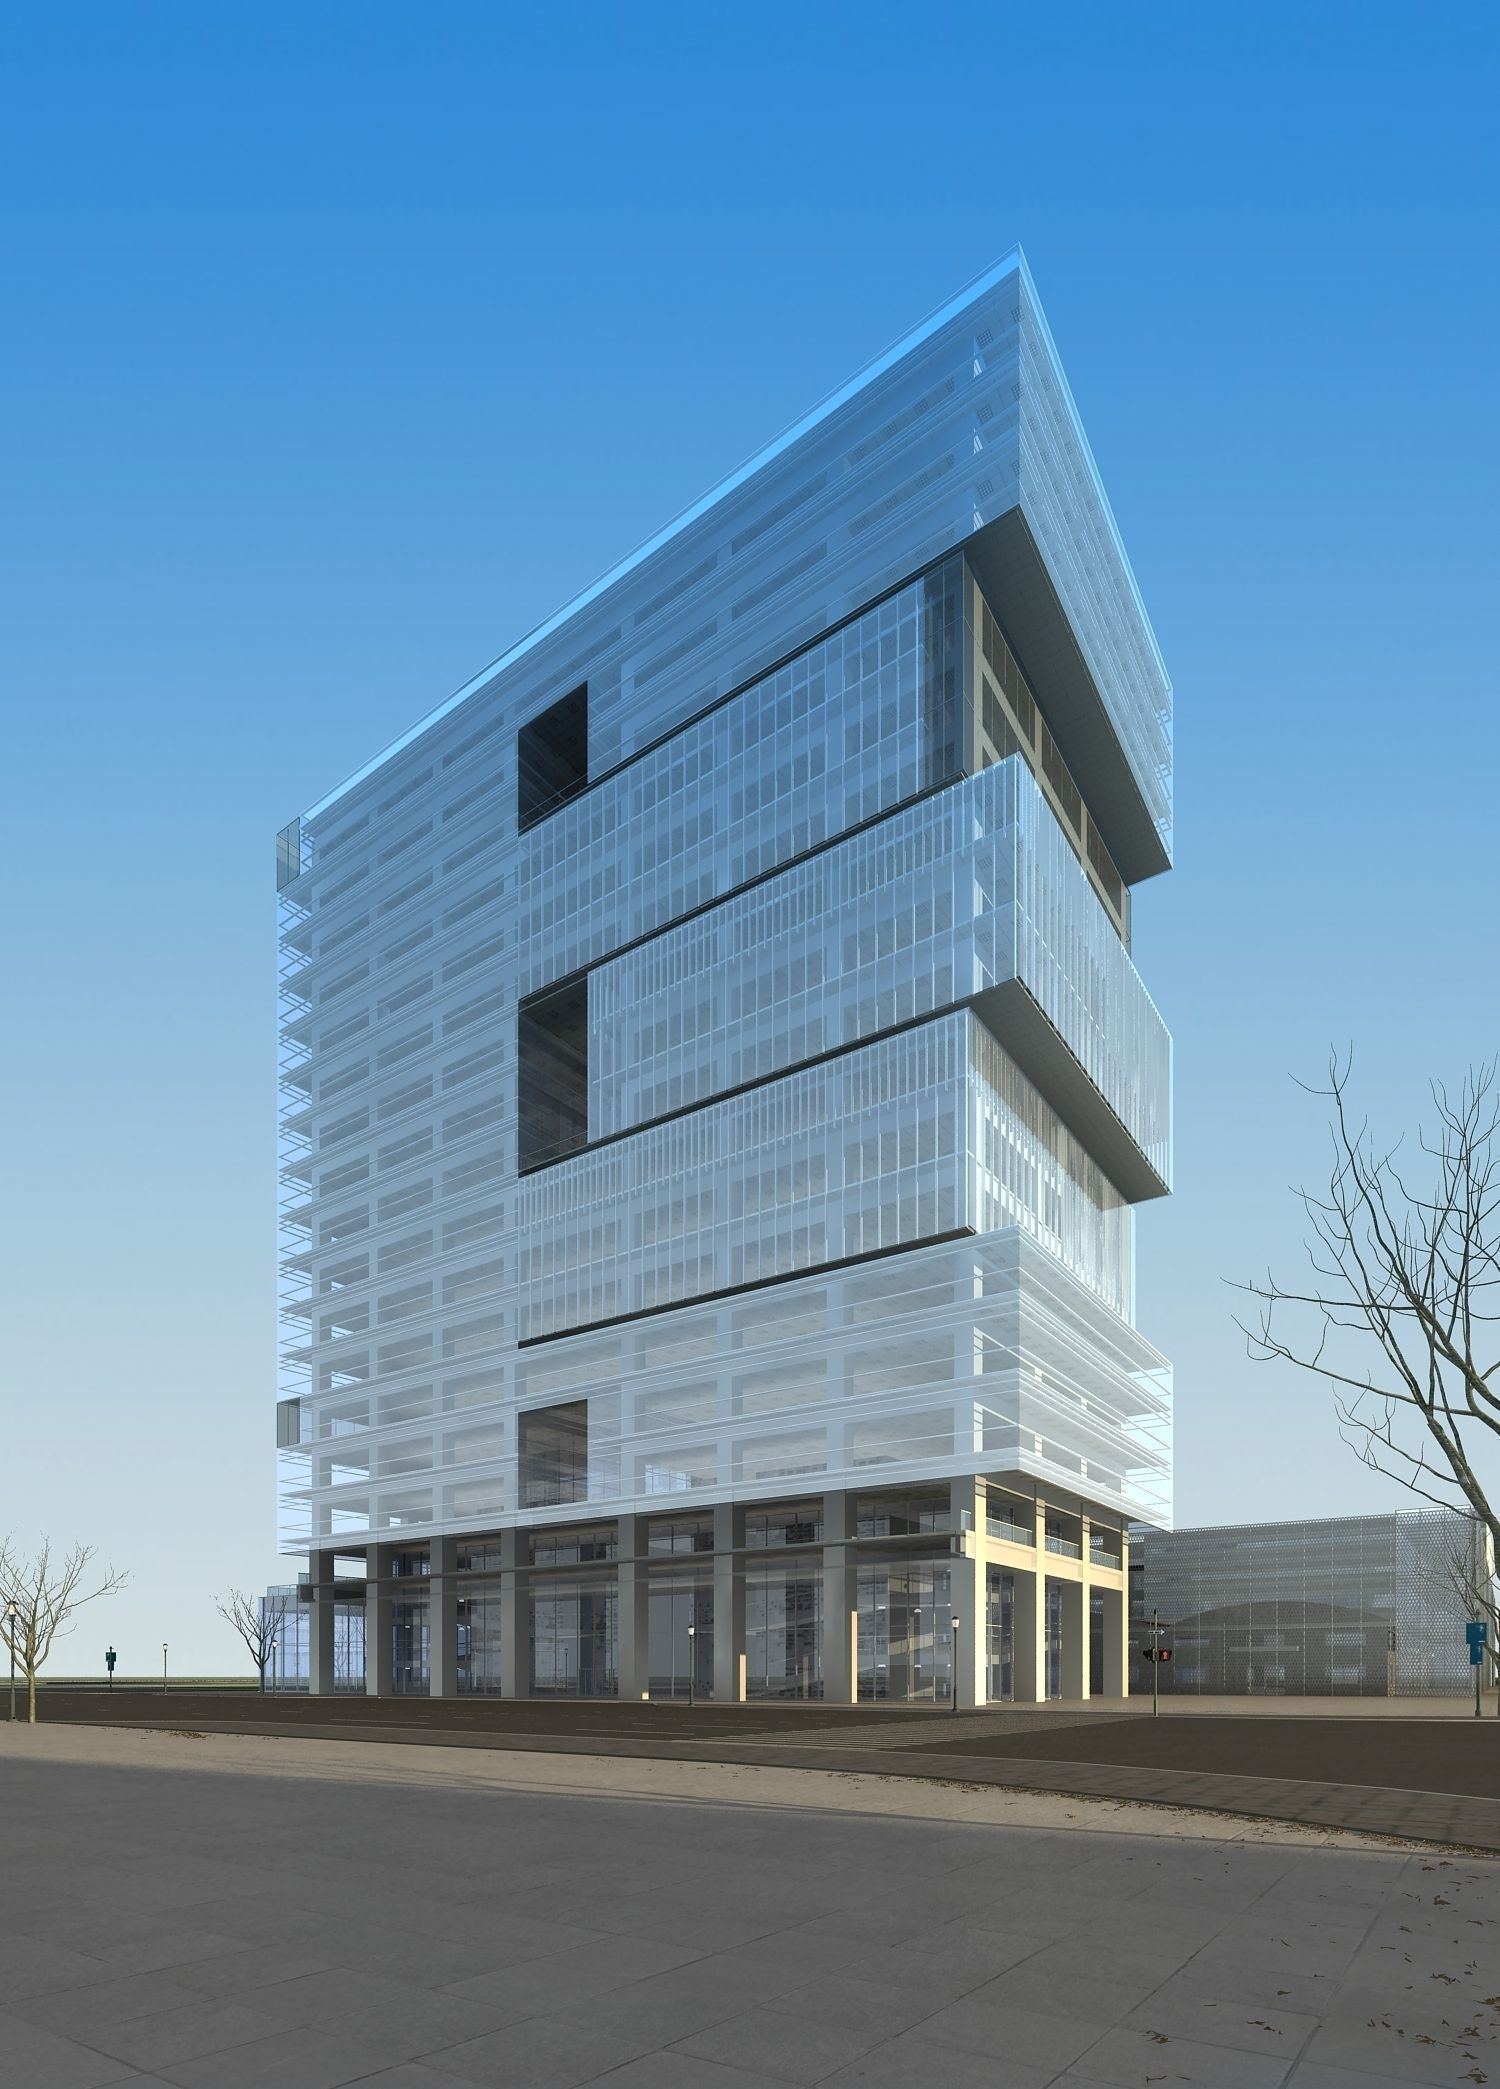 Modern commercial building design 3d model max for Modern commercial building exterior design